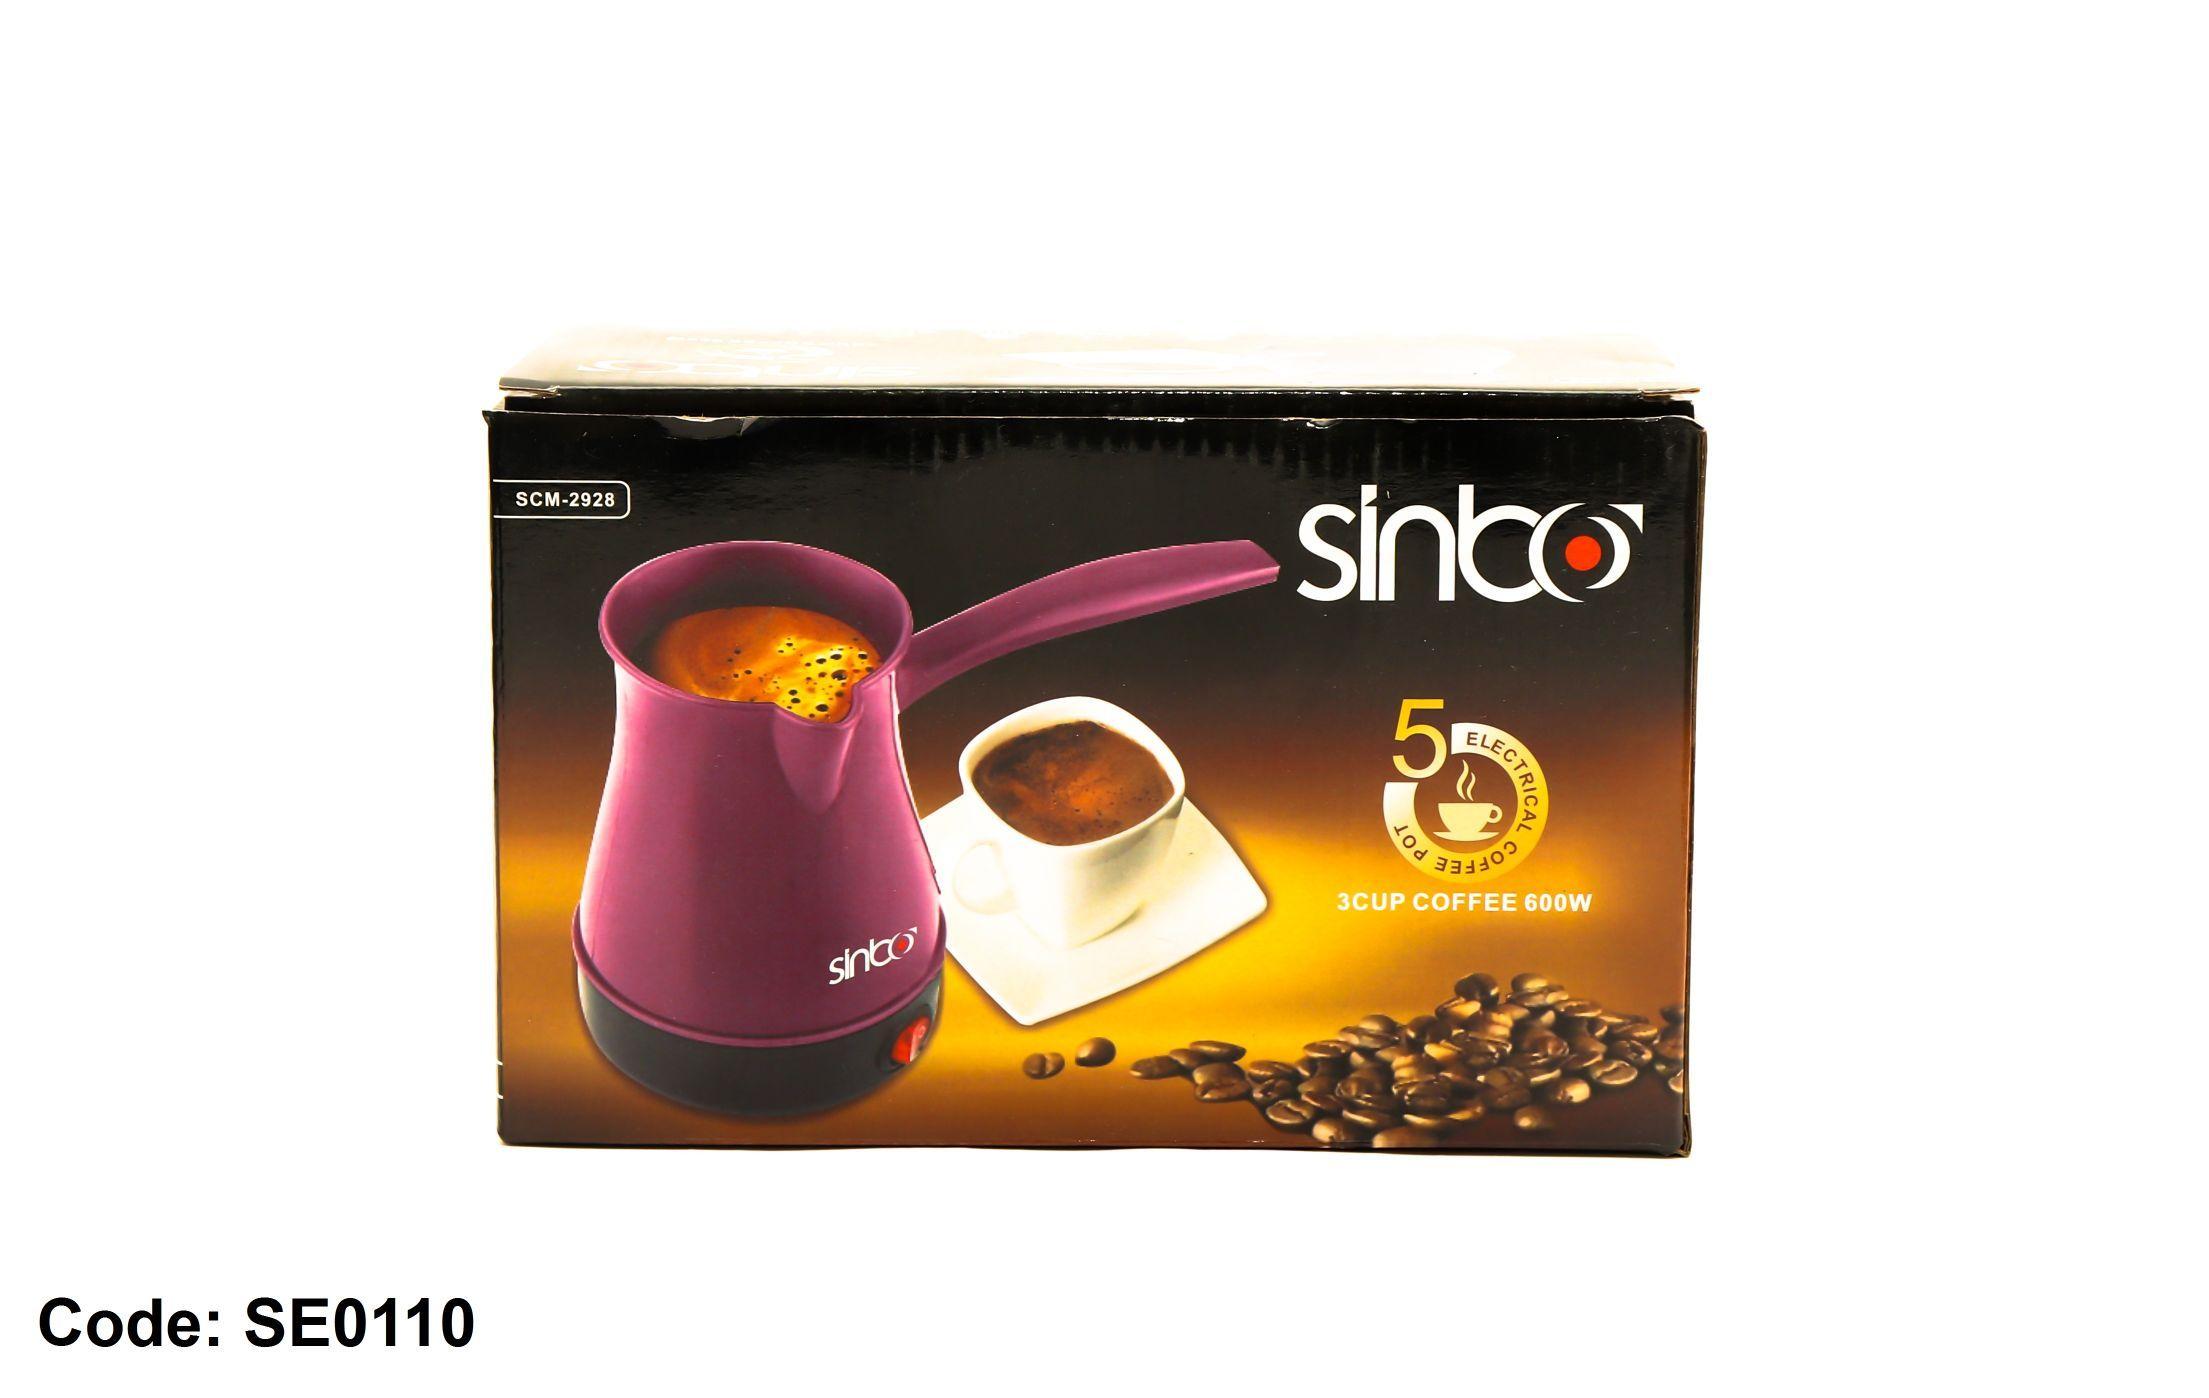 Turkish Coffee Maker Scm 2928 بسعر 180ج بدل من 240ج Coding Coffee